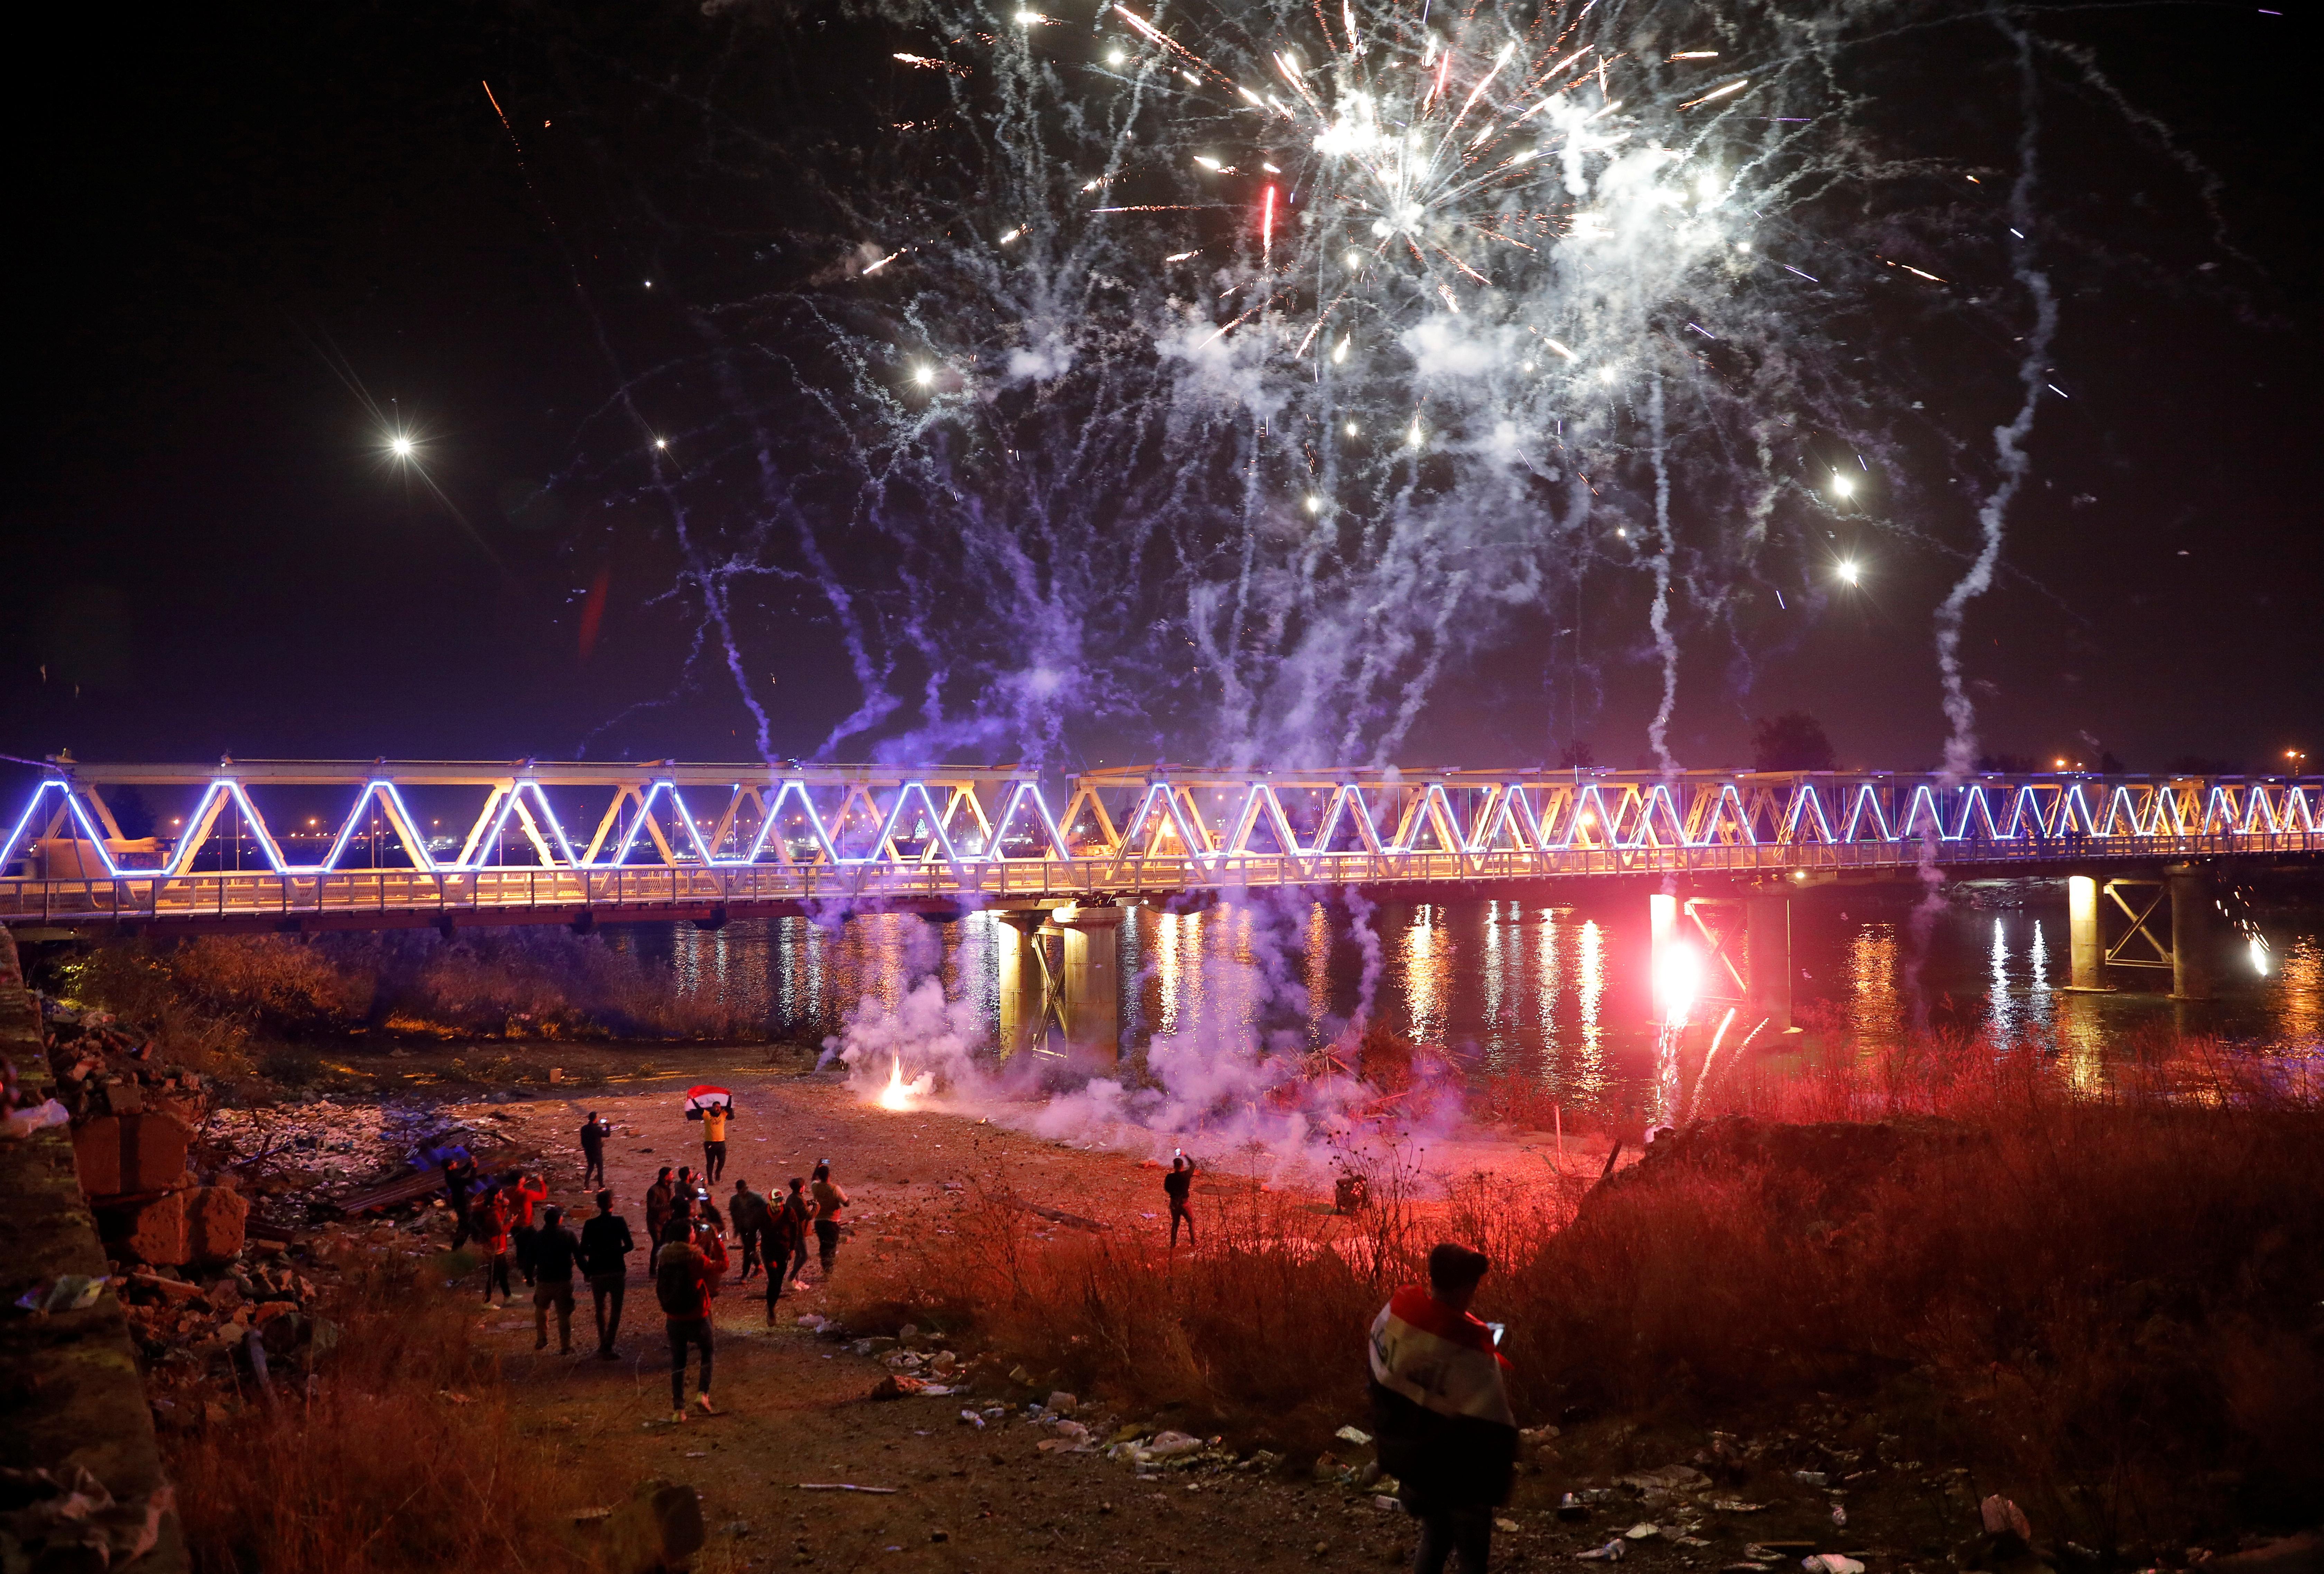 También hubo festejos en Mosul, Irak (REUTERS/Abdullah Rashid)